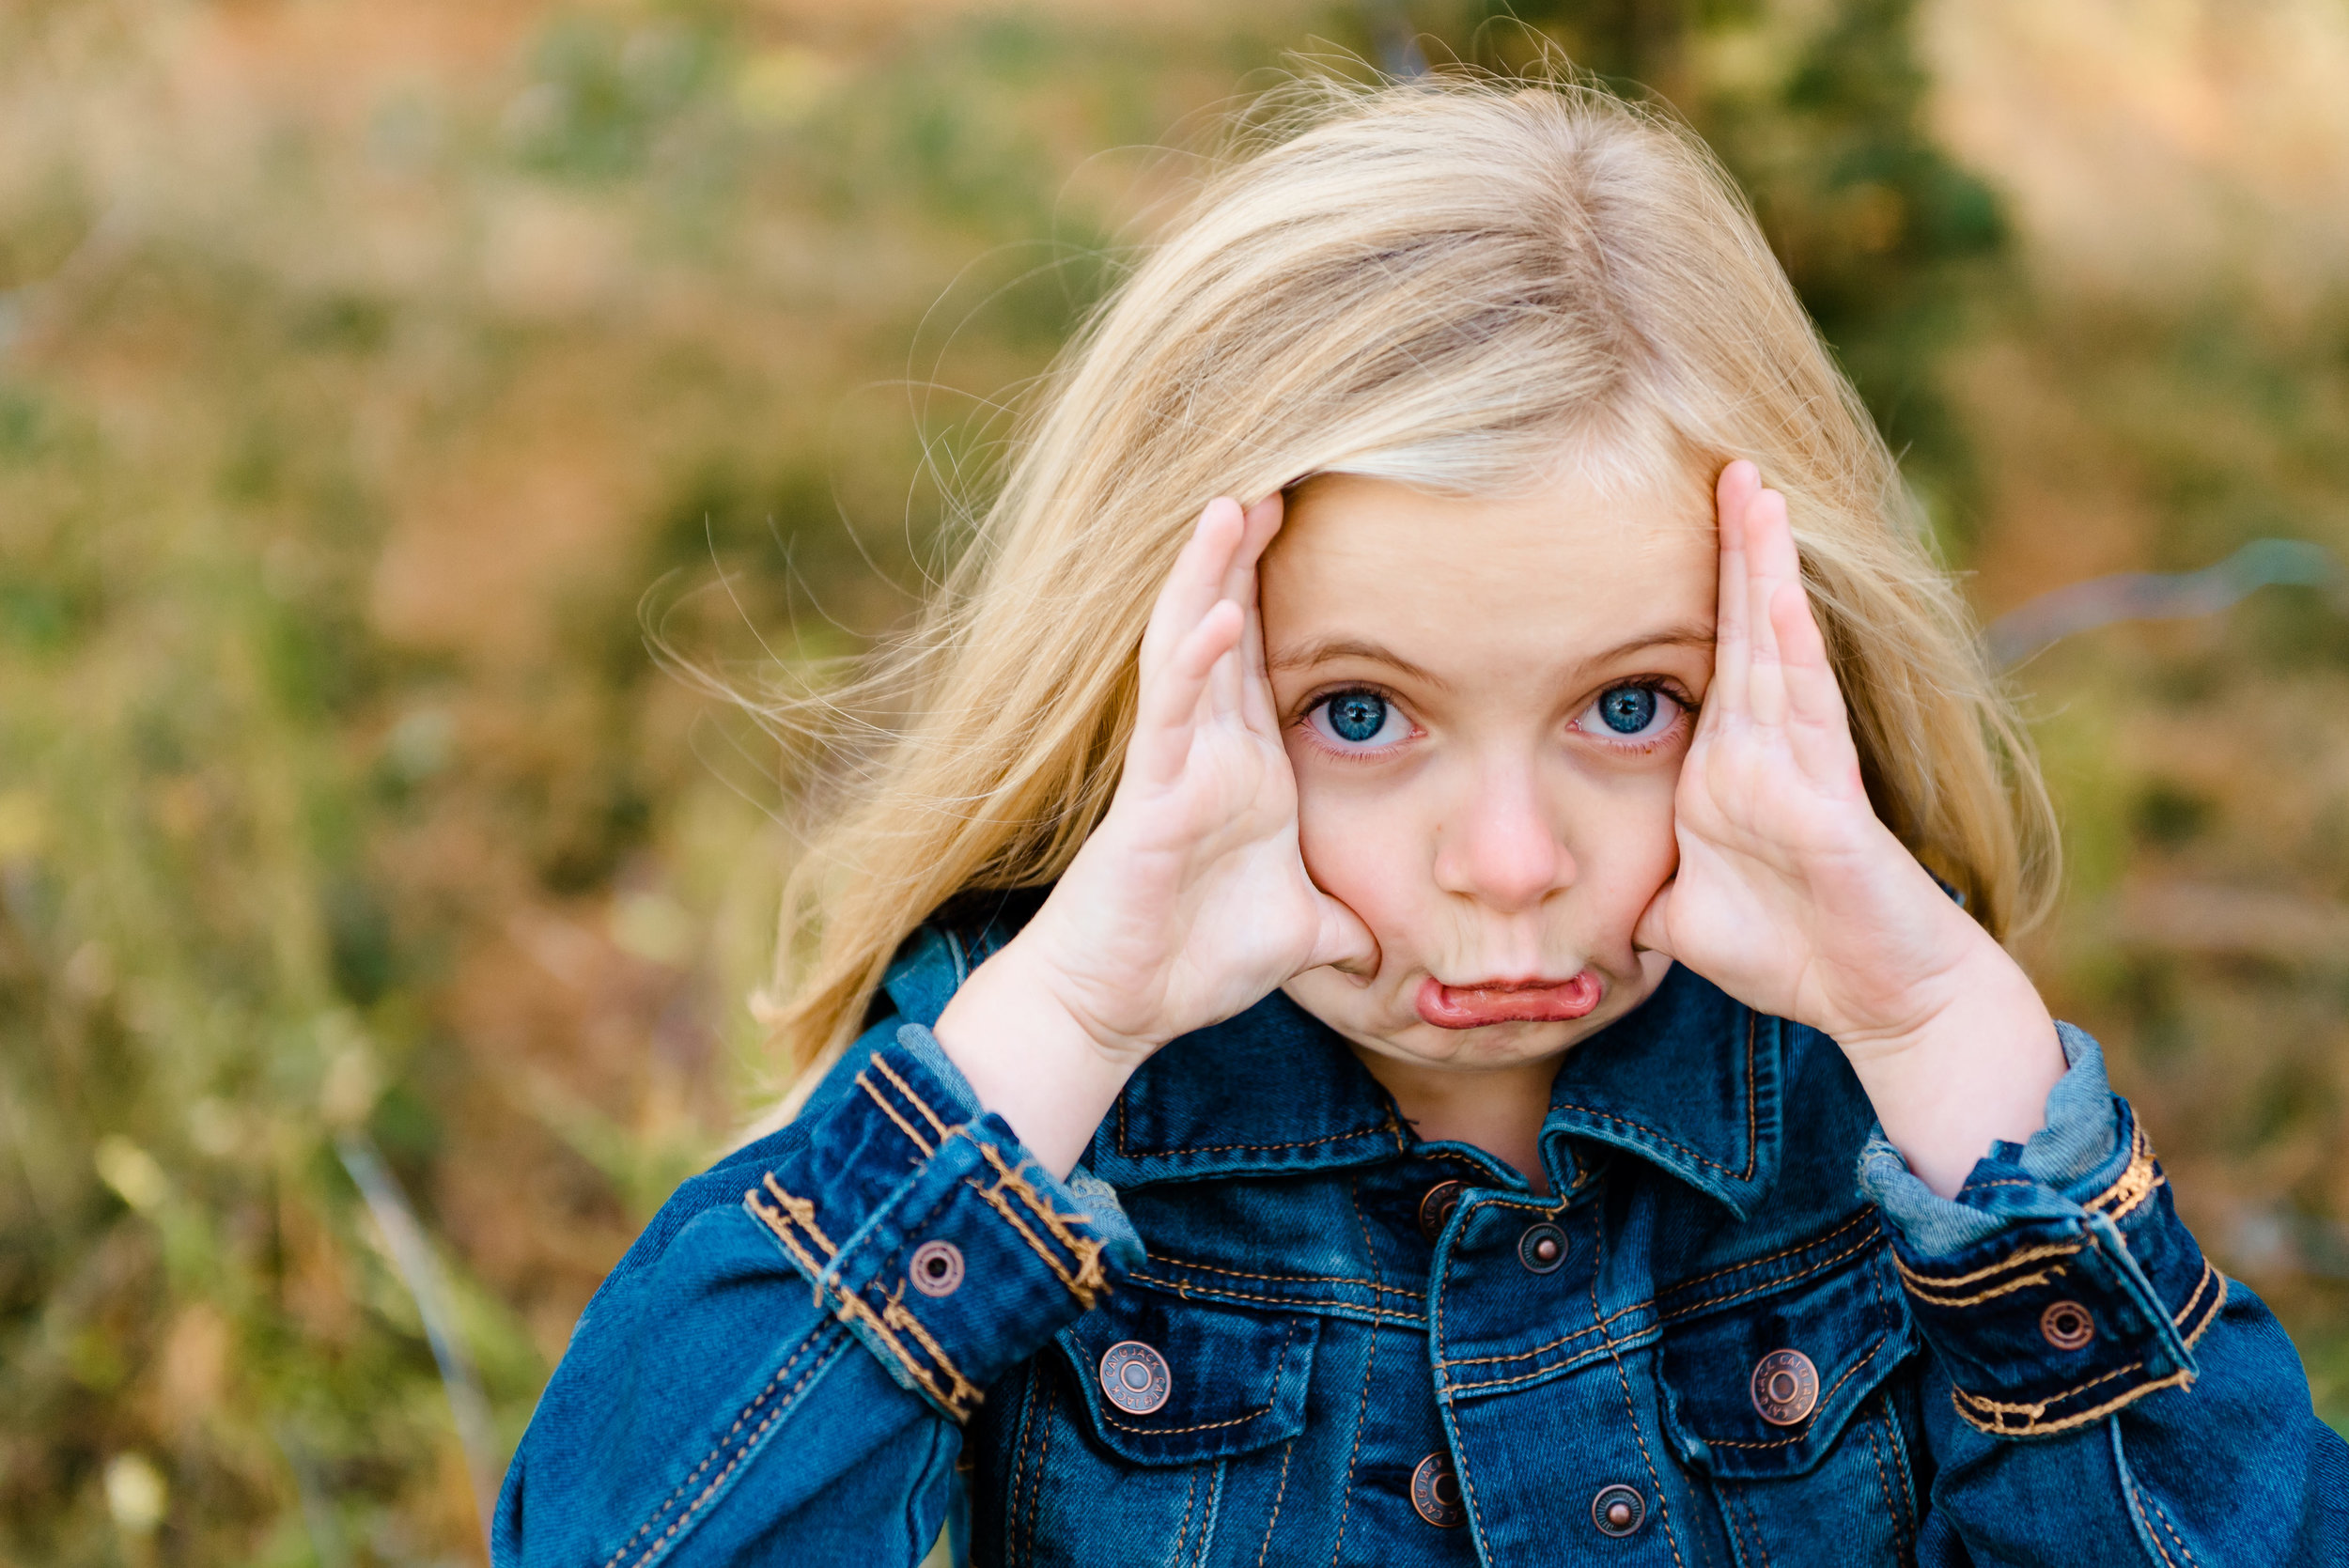 Laur Robinson Photography   www.laurarobinsonphoto.com